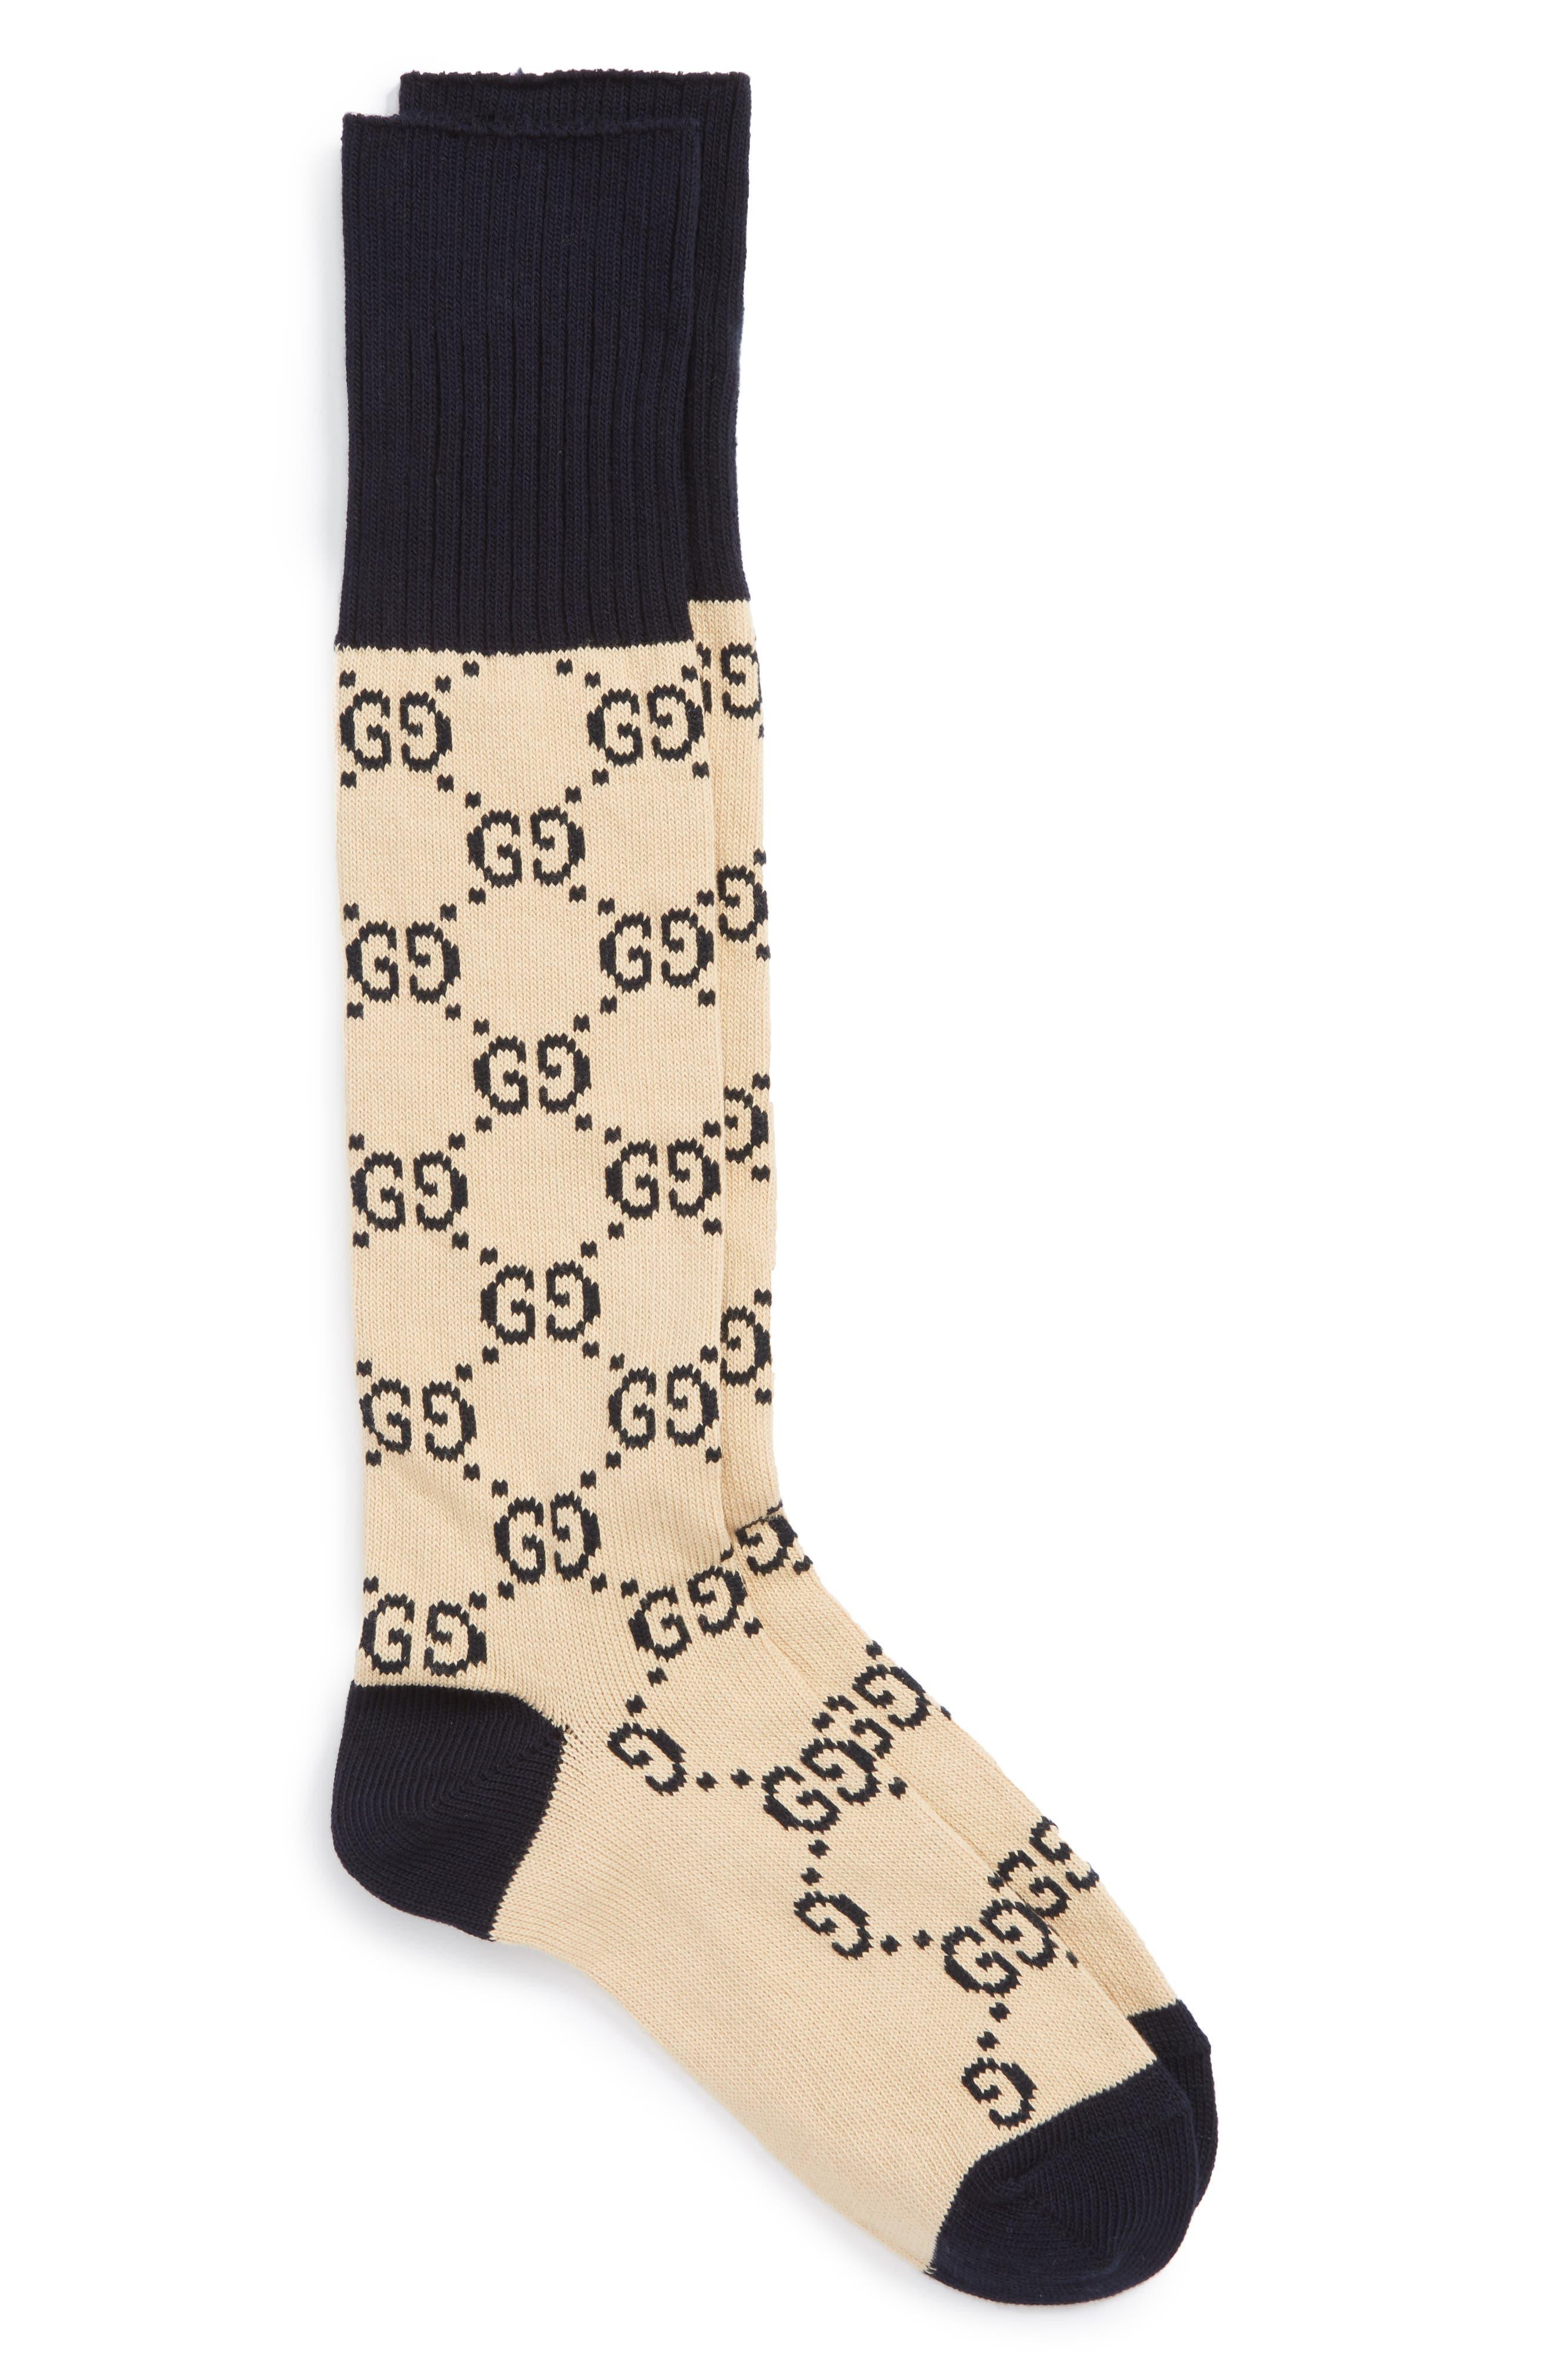 GG Socks,                             Main thumbnail 1, color,                             131